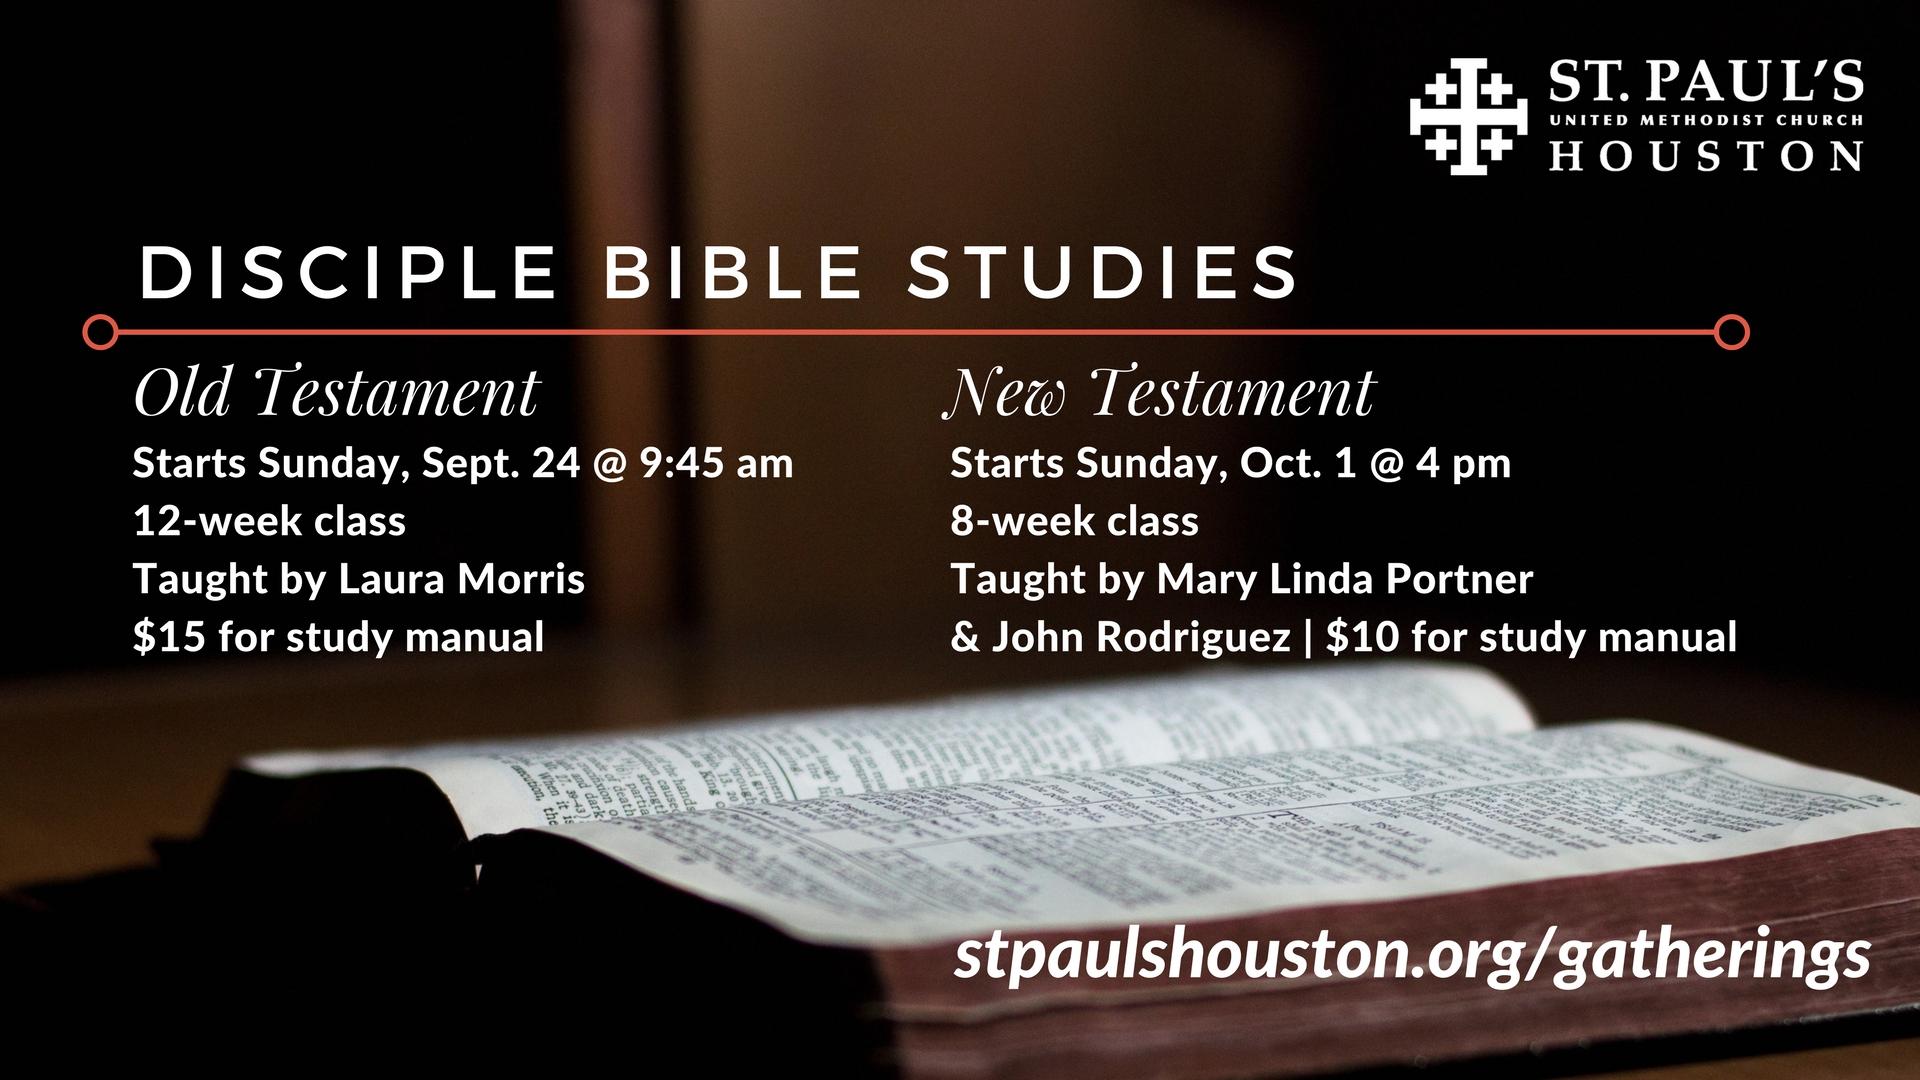 16x9 Disciple Bible Studies.jpg